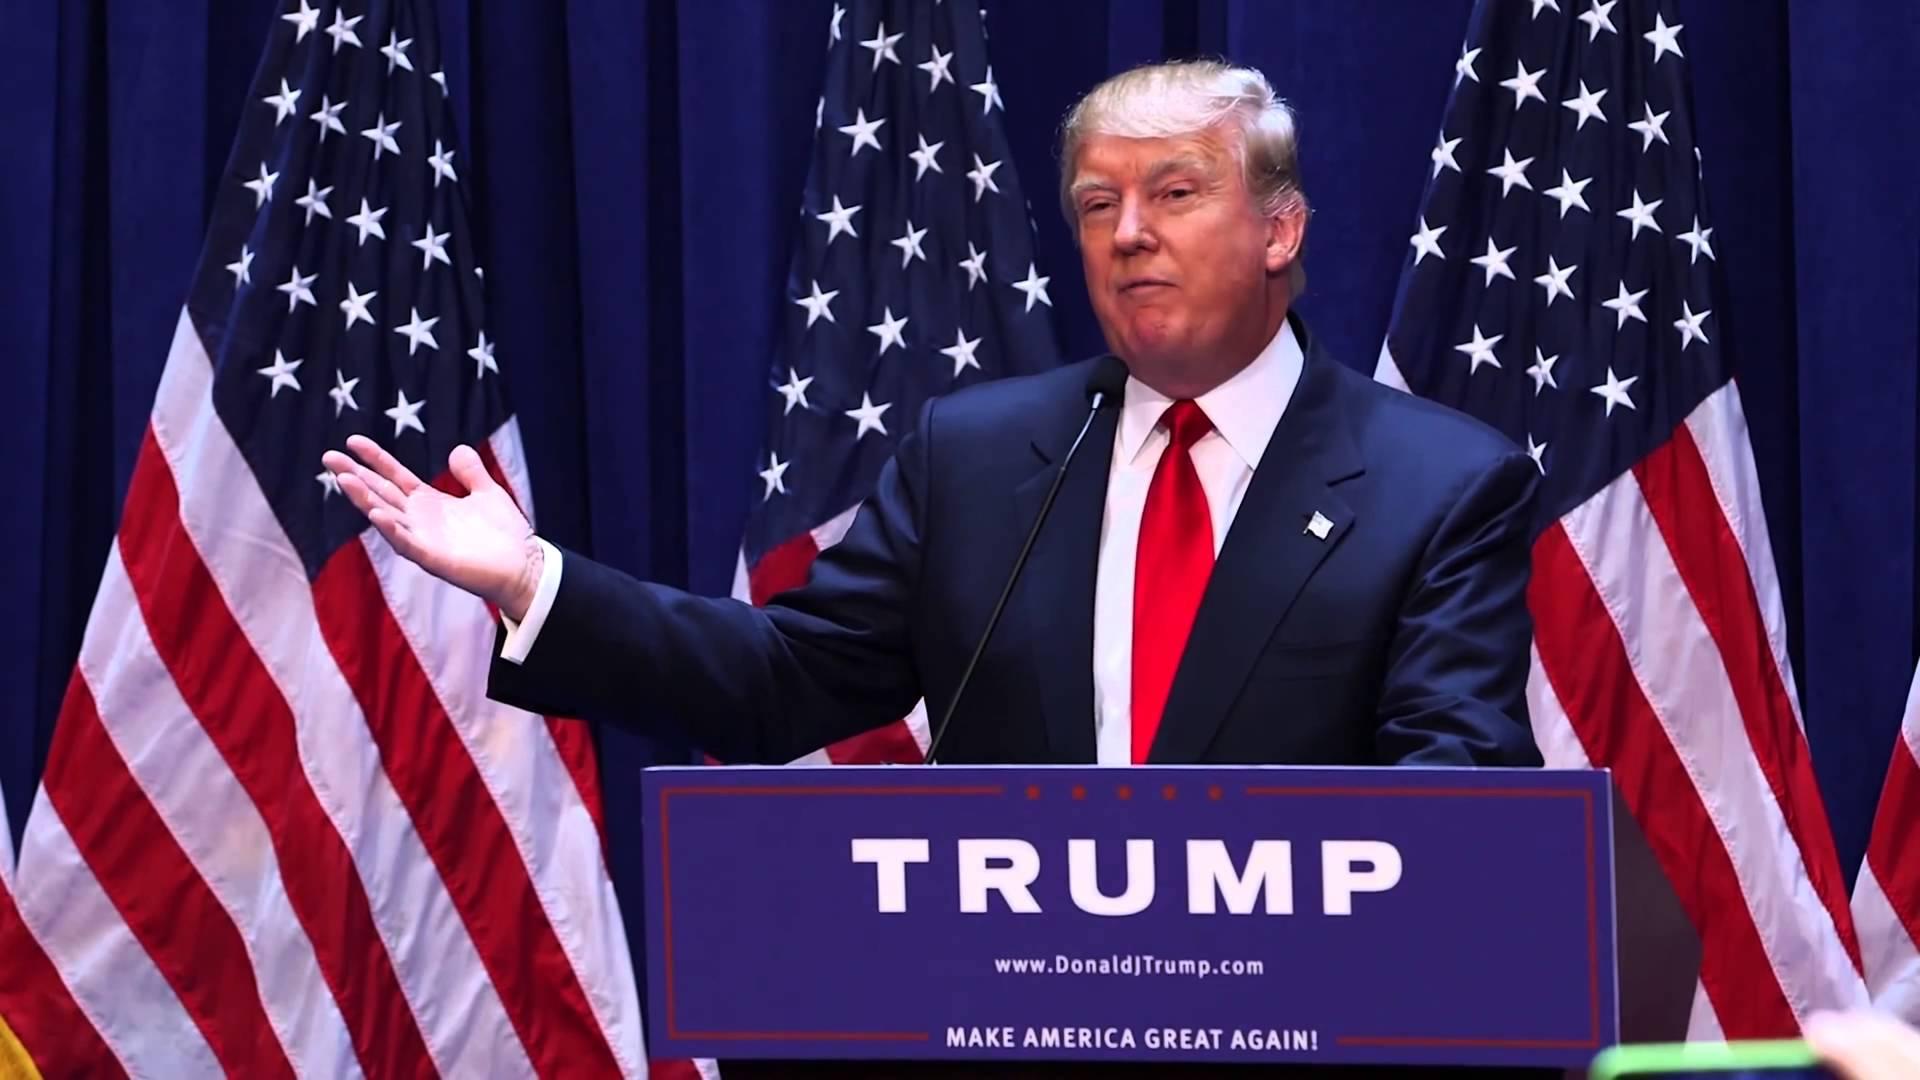 Underestimate Donald Trump